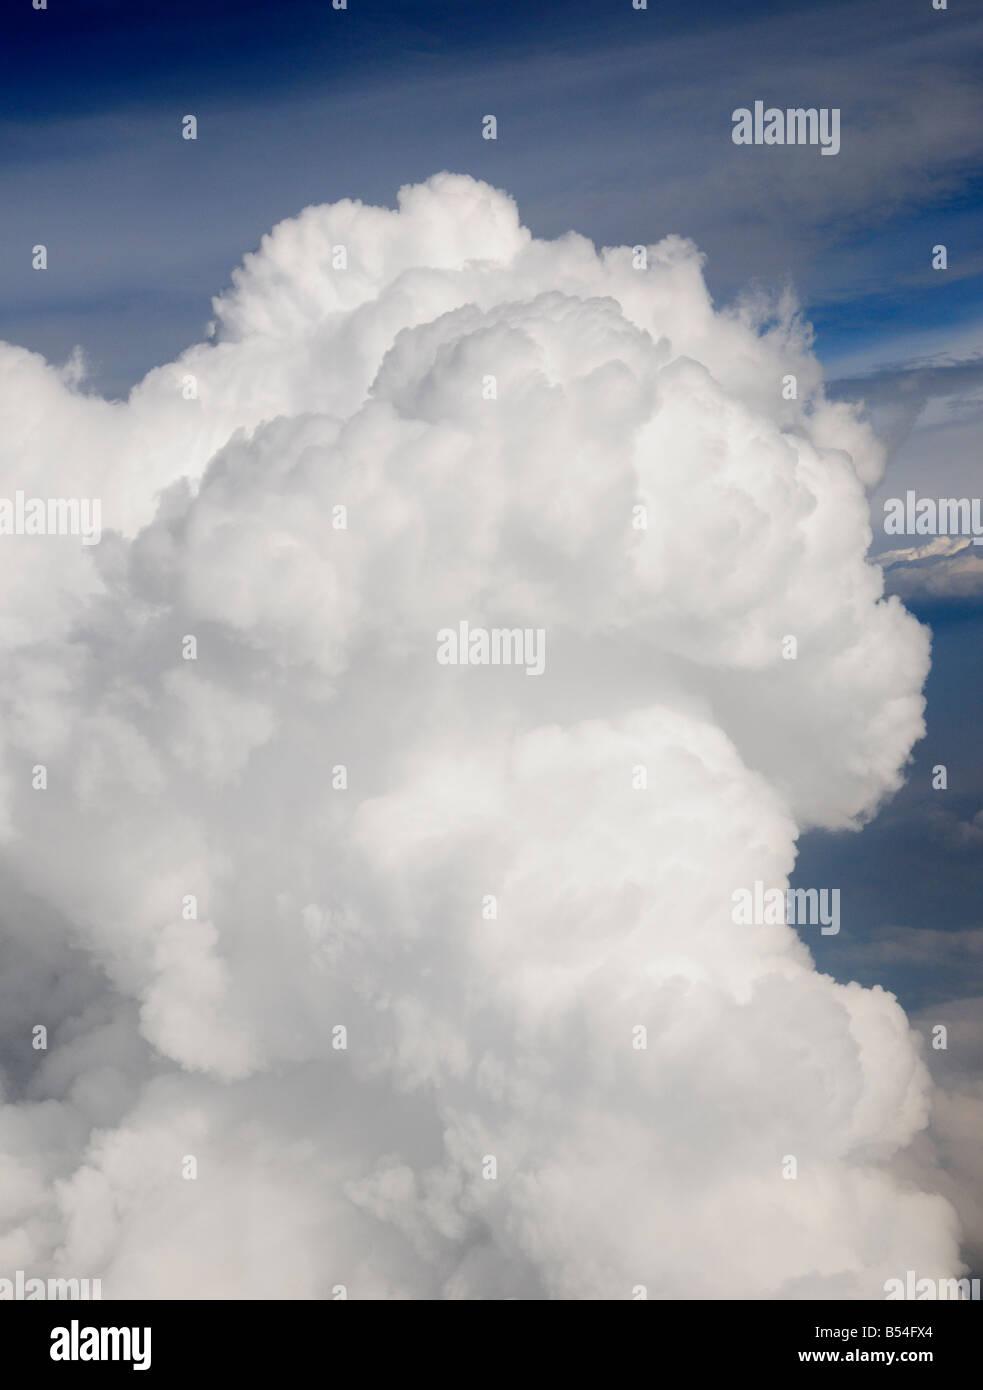 Aerial view looking down on a cumulonimbus thunderstorm cloud - Stock Image